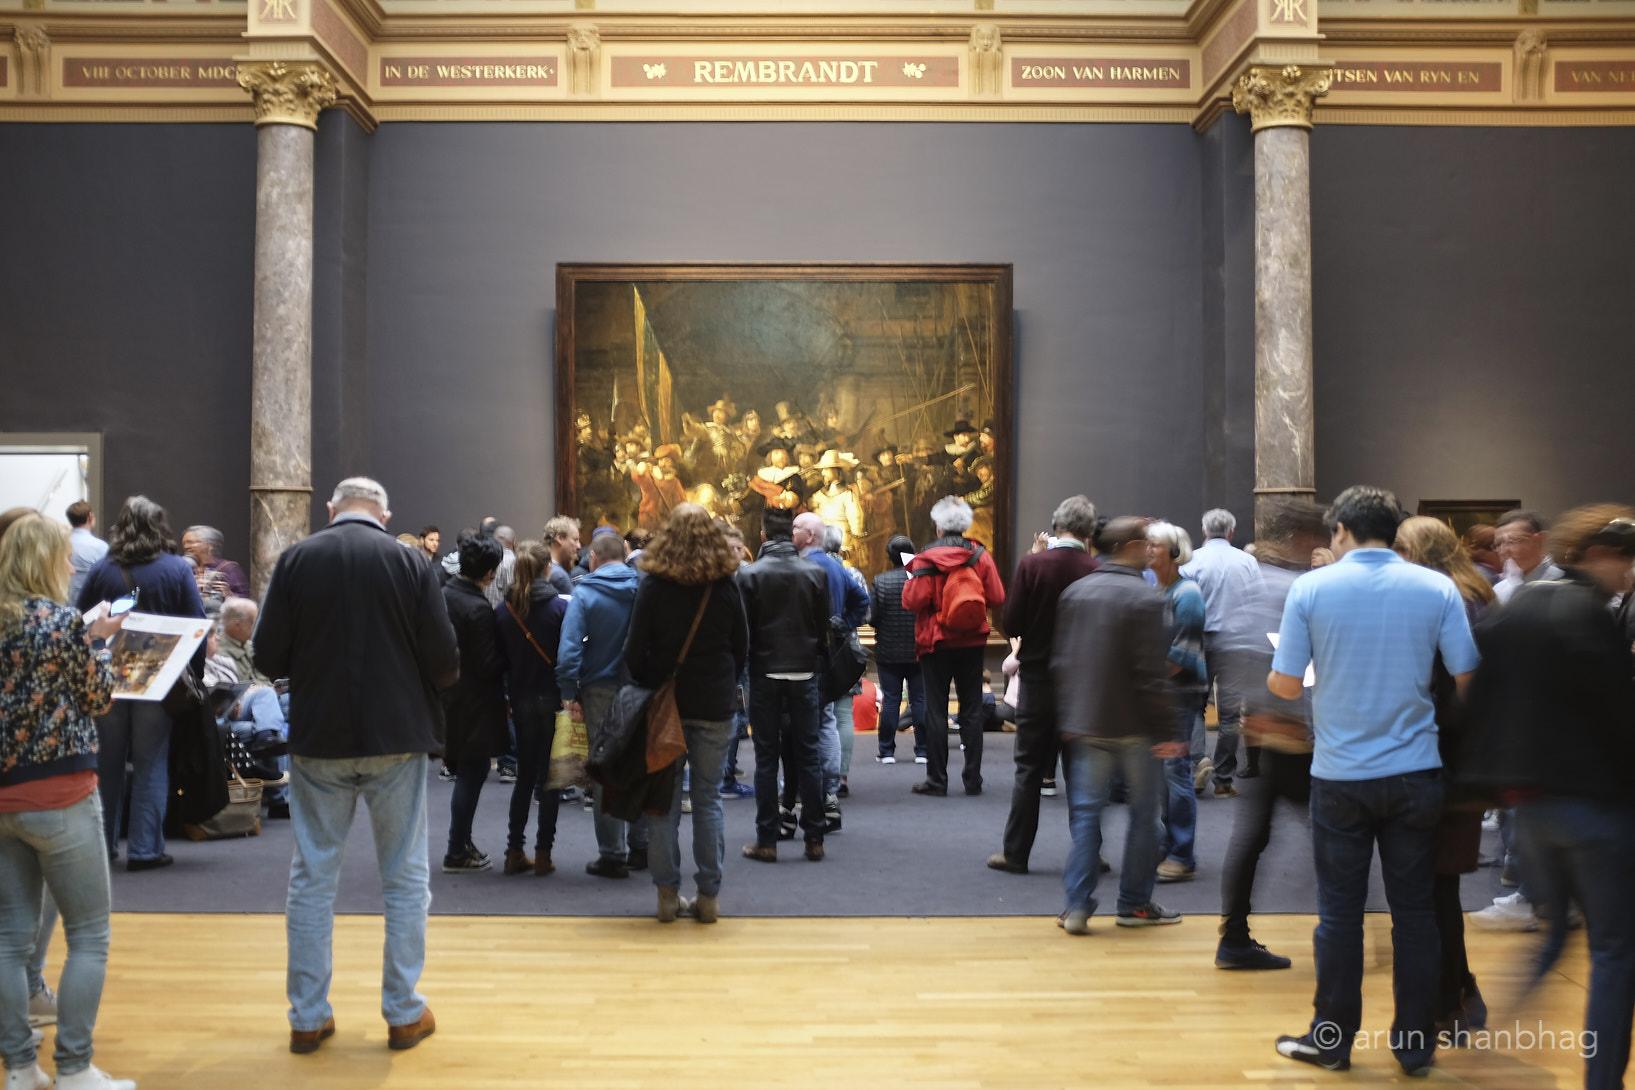 Rembrandt's Night Watch at Rijksmuseum Netherlands by Arun Shanbhag